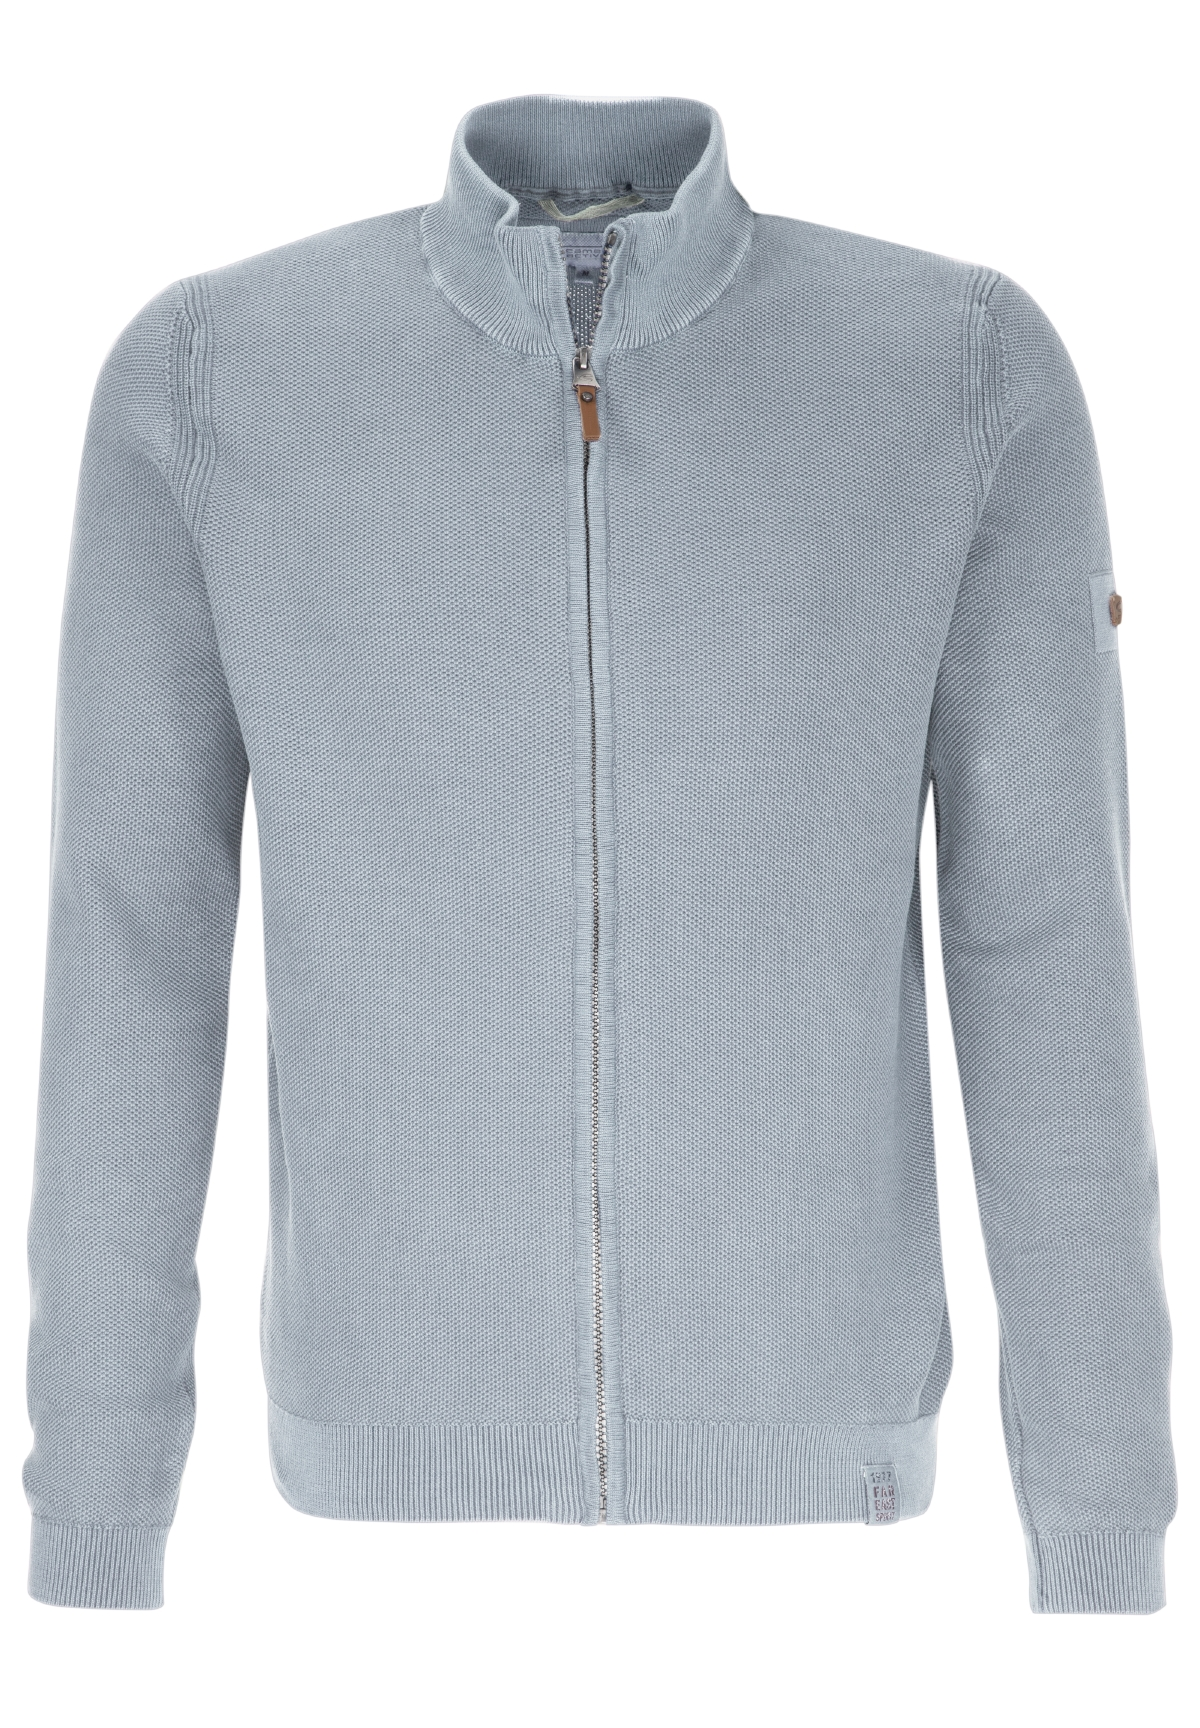 Jacke Garment-Dyed